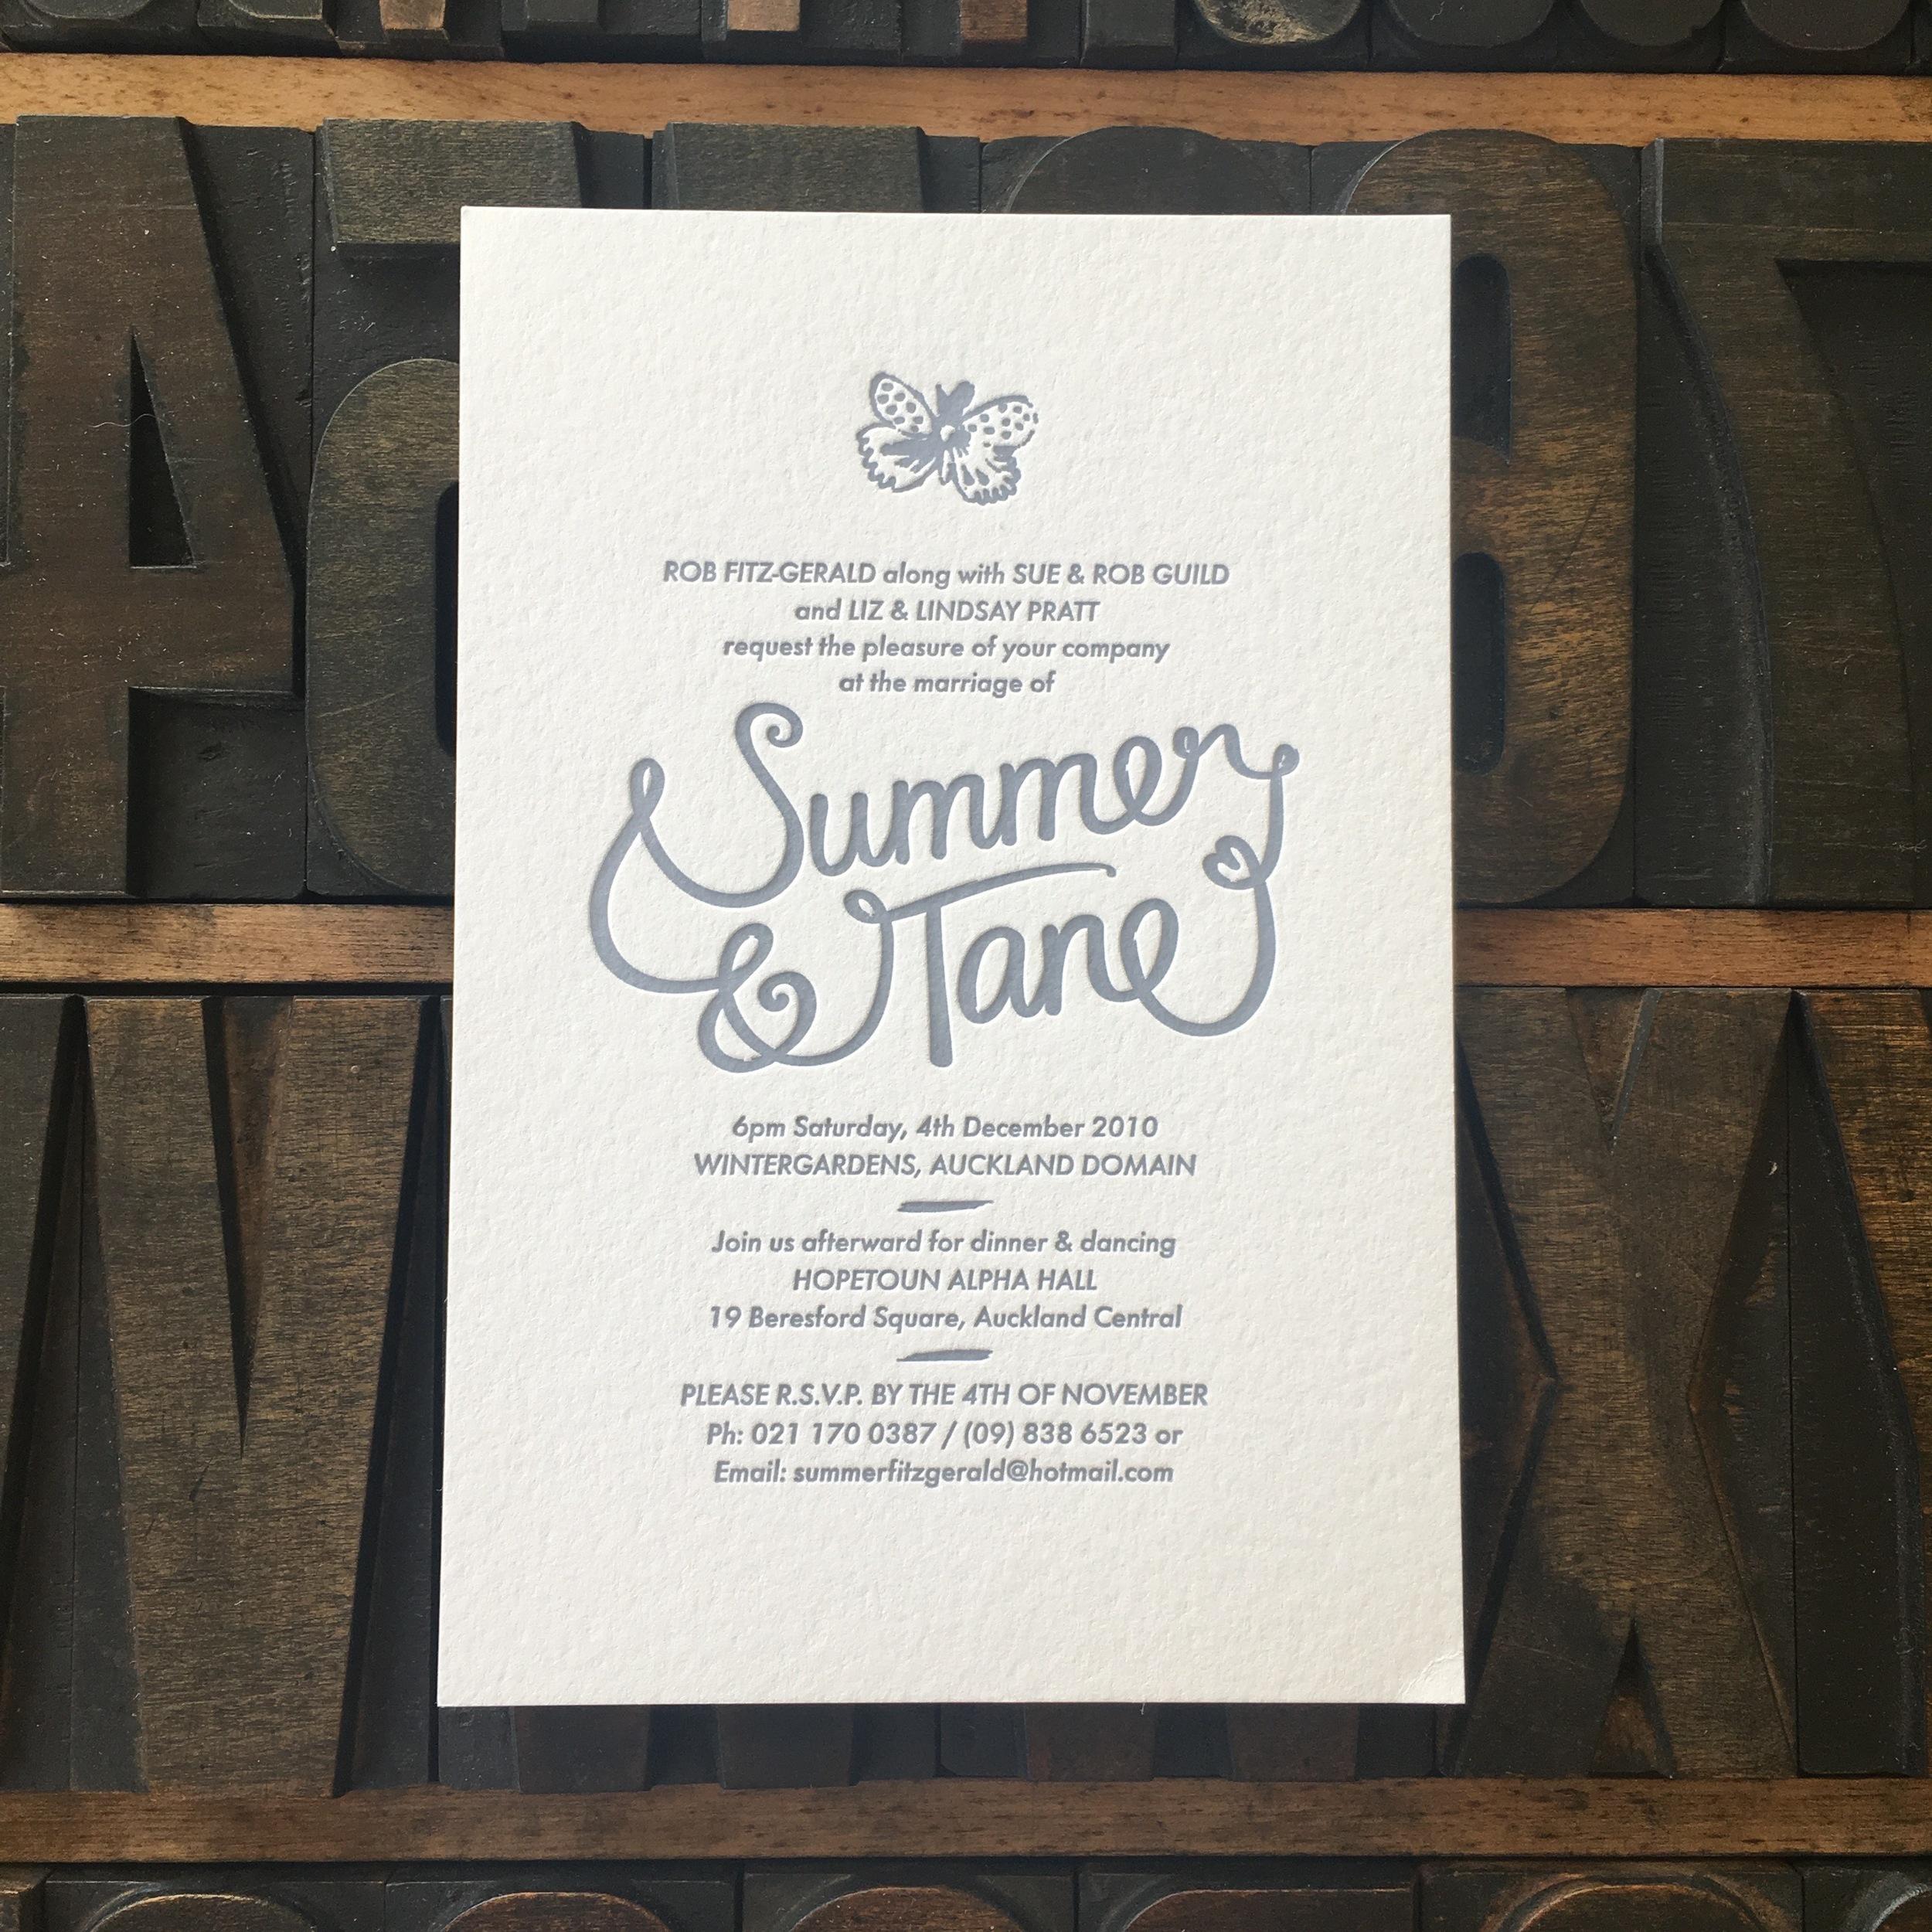 Summer & Tane